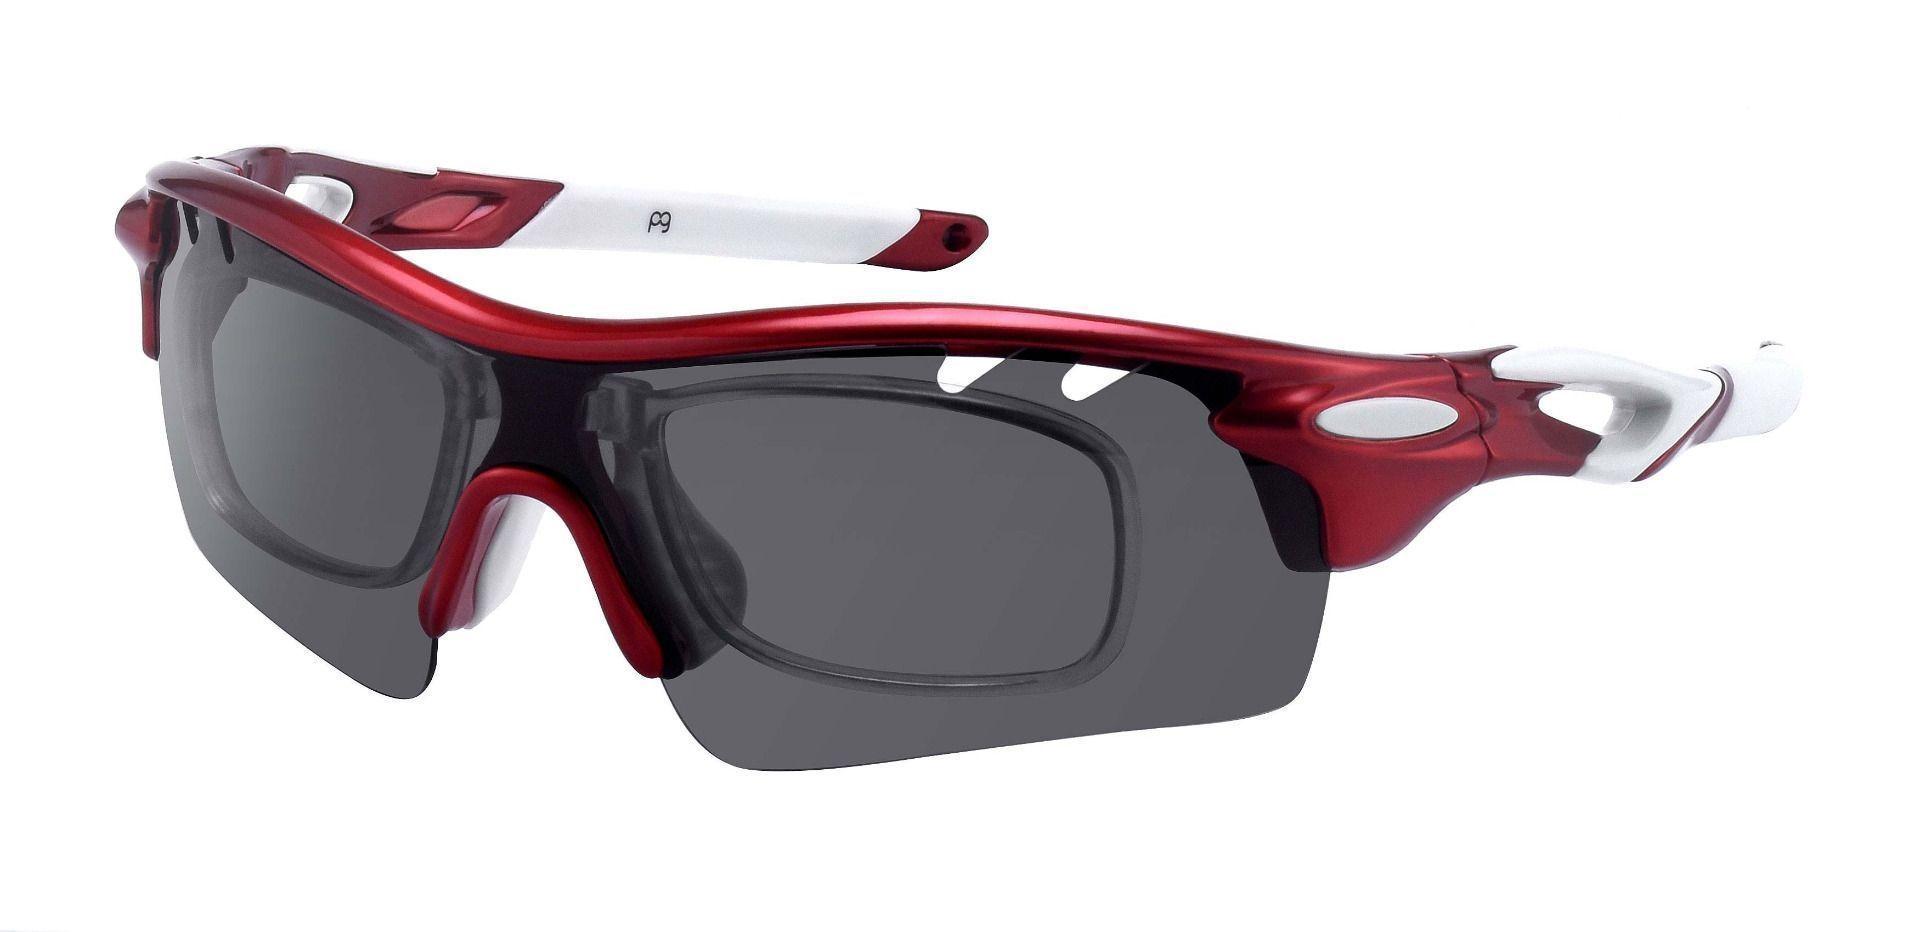 Jackson Sport Glasses Prescription Glasses - Red